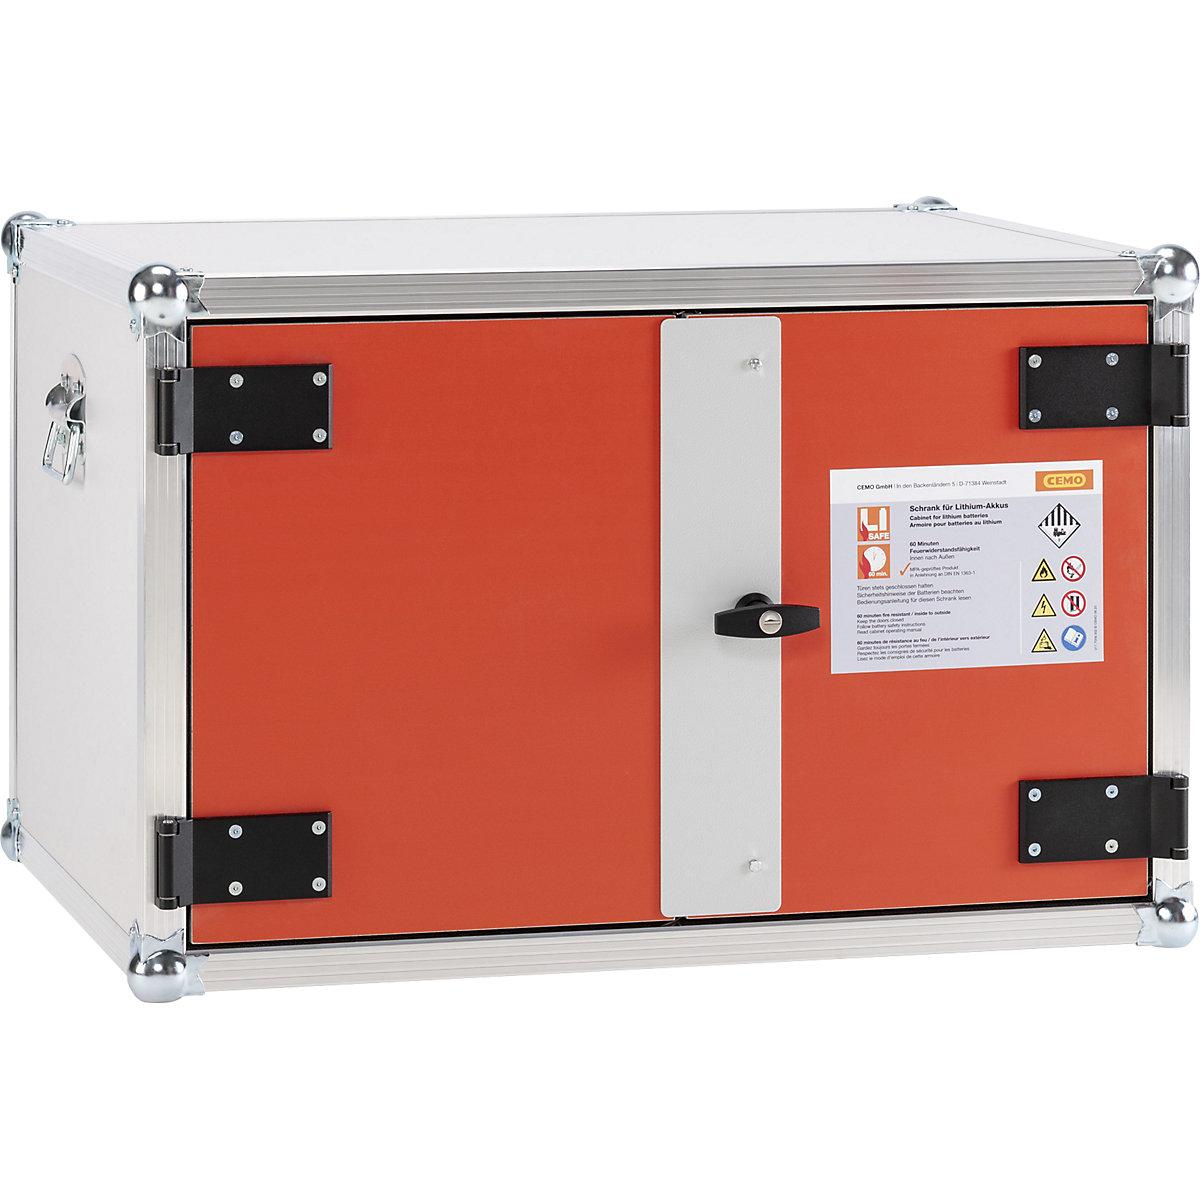 Cemo Fr 60 Safety Battery Charging Cabinet Premium Wxdxh 890 X 660 X 520 Mm Kaiser Kraft International